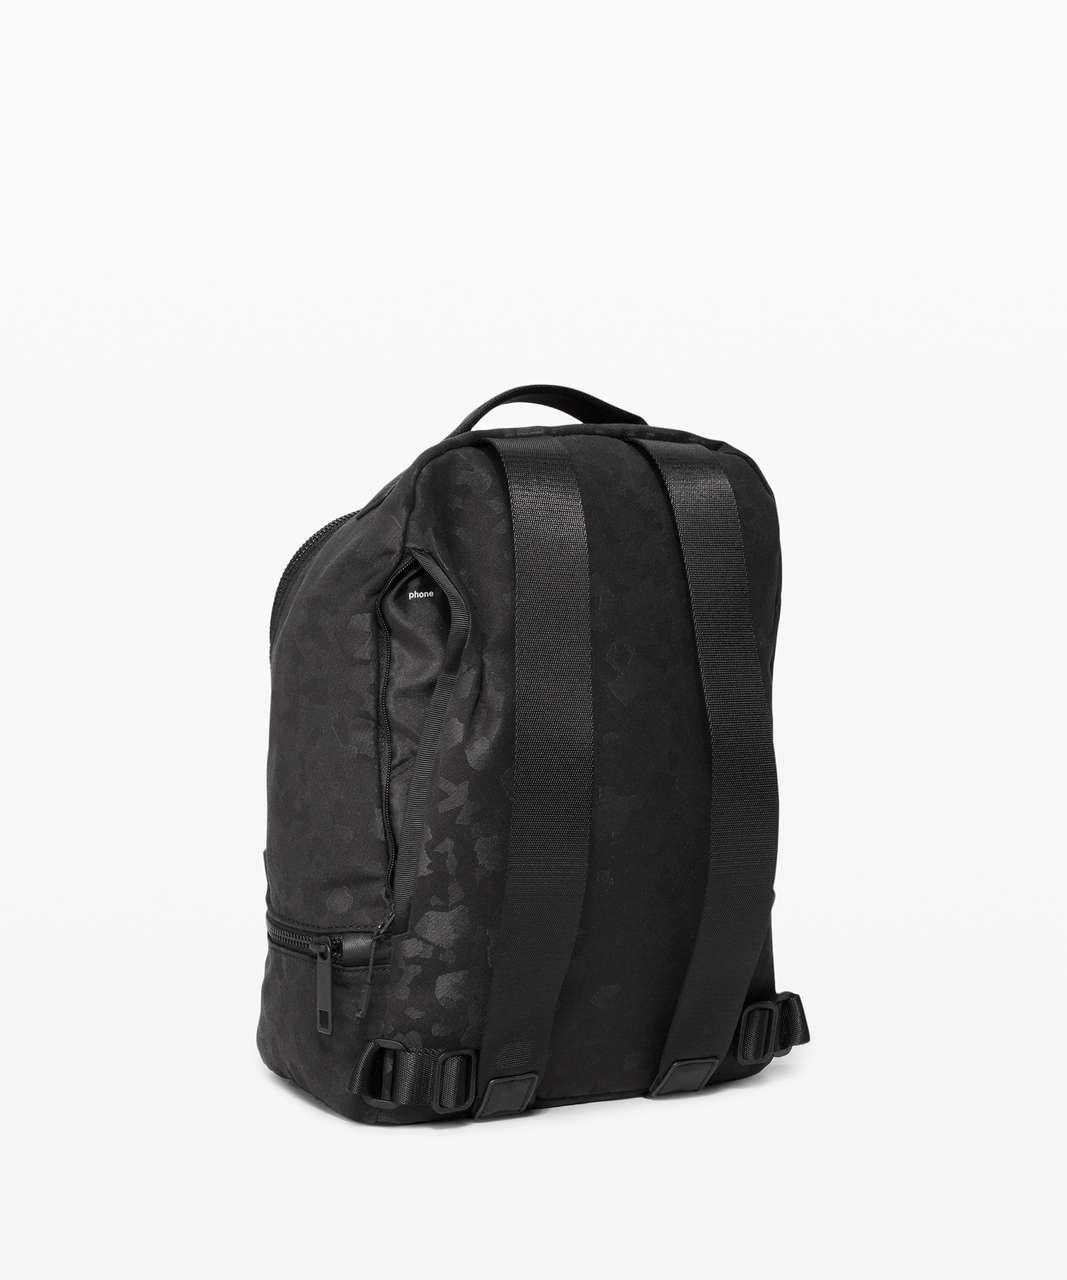 Lululemon City Adventurer Backpack Mini *10L - Fragment Camo Jacquard Black Deep Coal